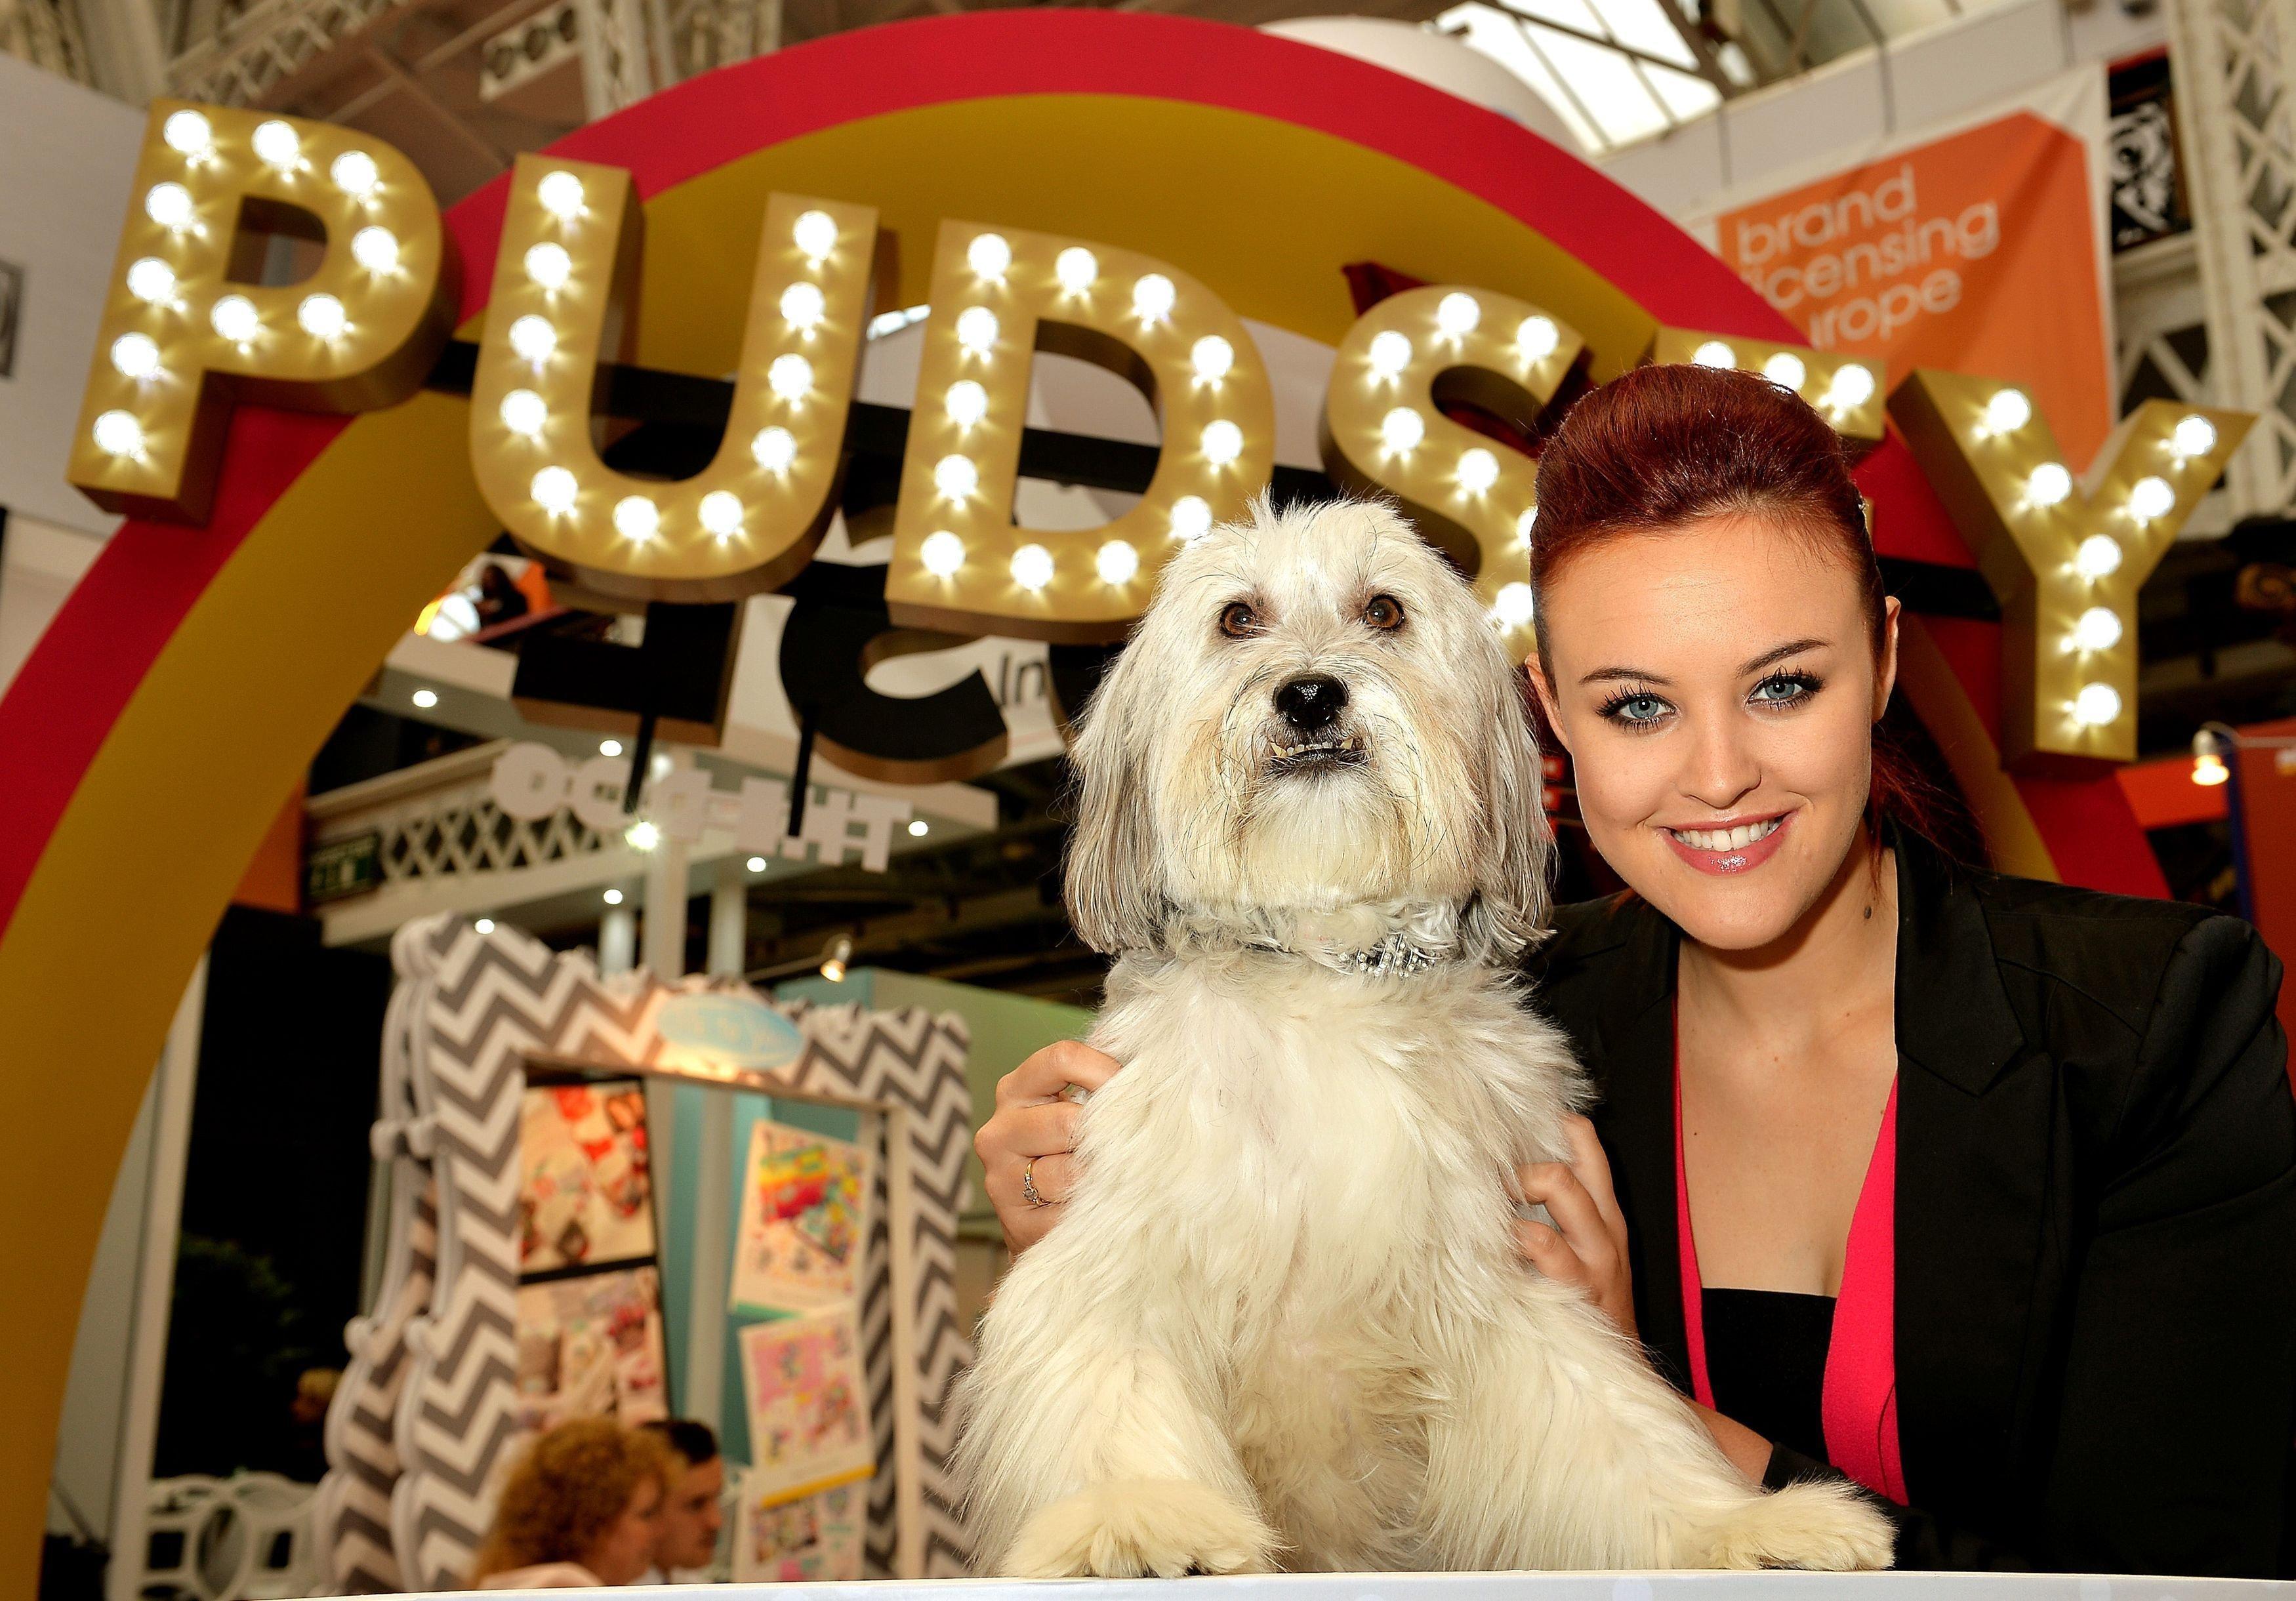 'Britain's Got Talent' Winner Pudsey Has